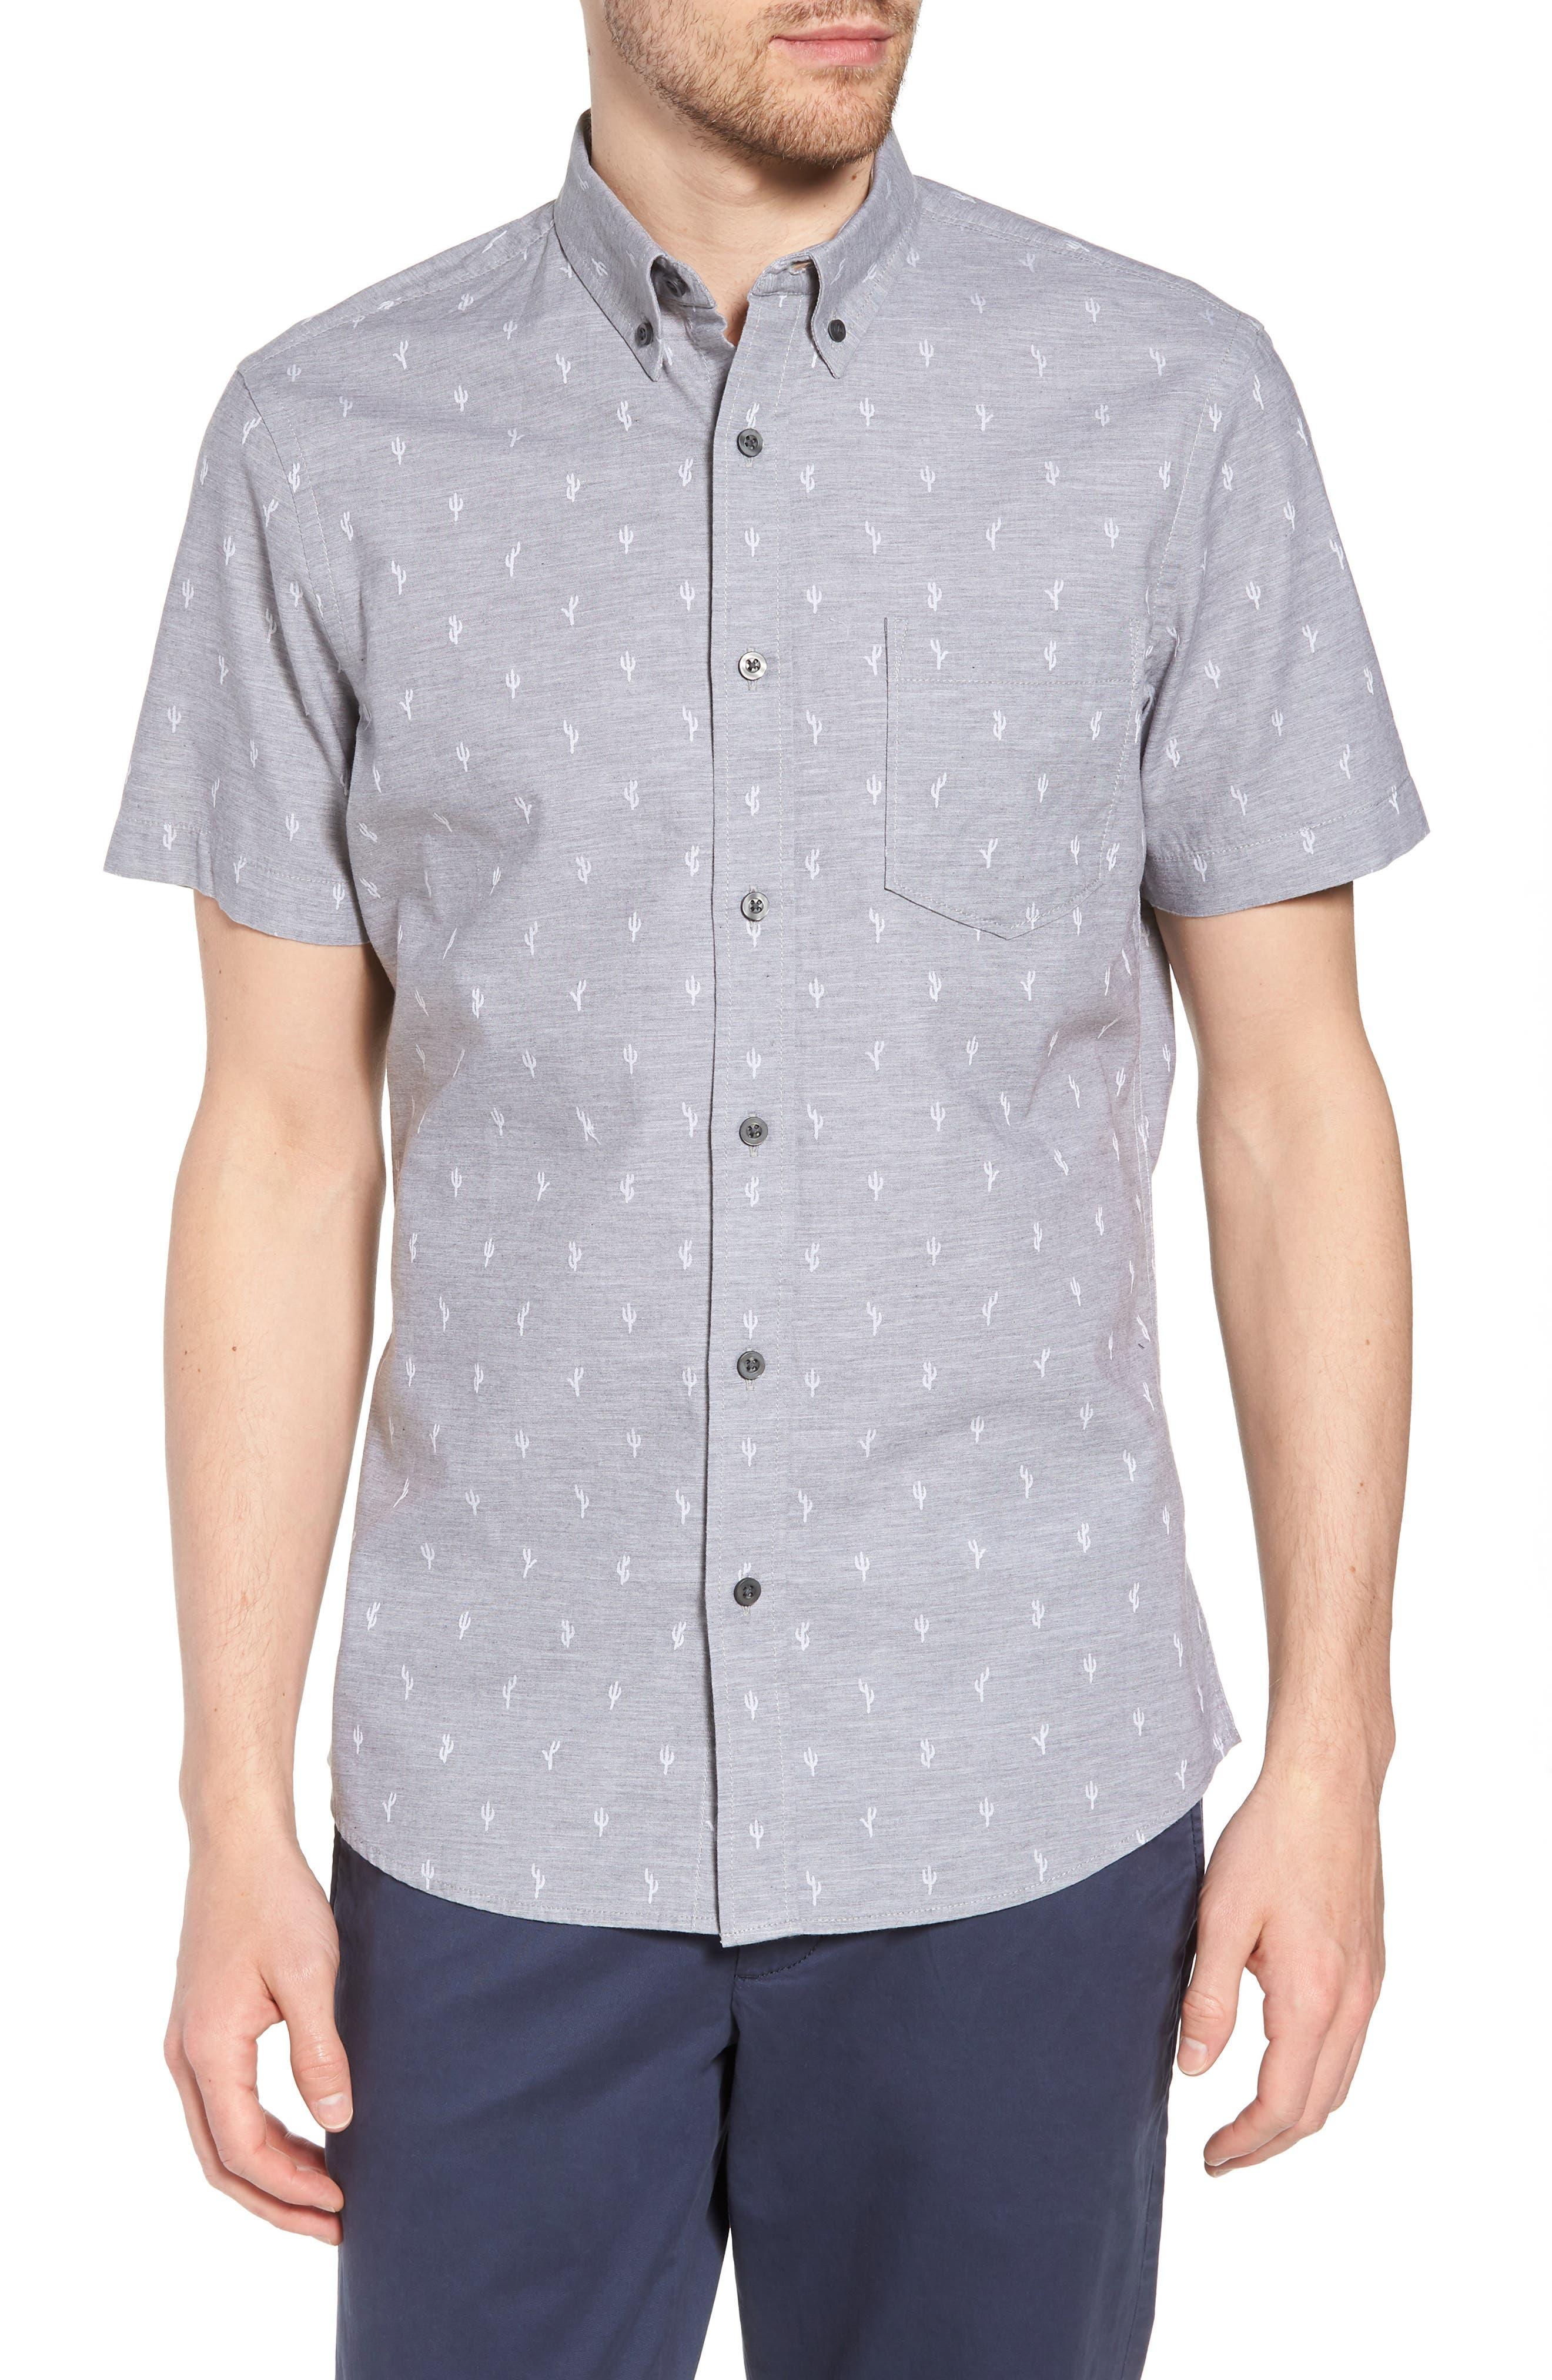 Cactus Print Dobby Sport Shirt,                         Main,                         color, Grey Weather Cactus Dobby